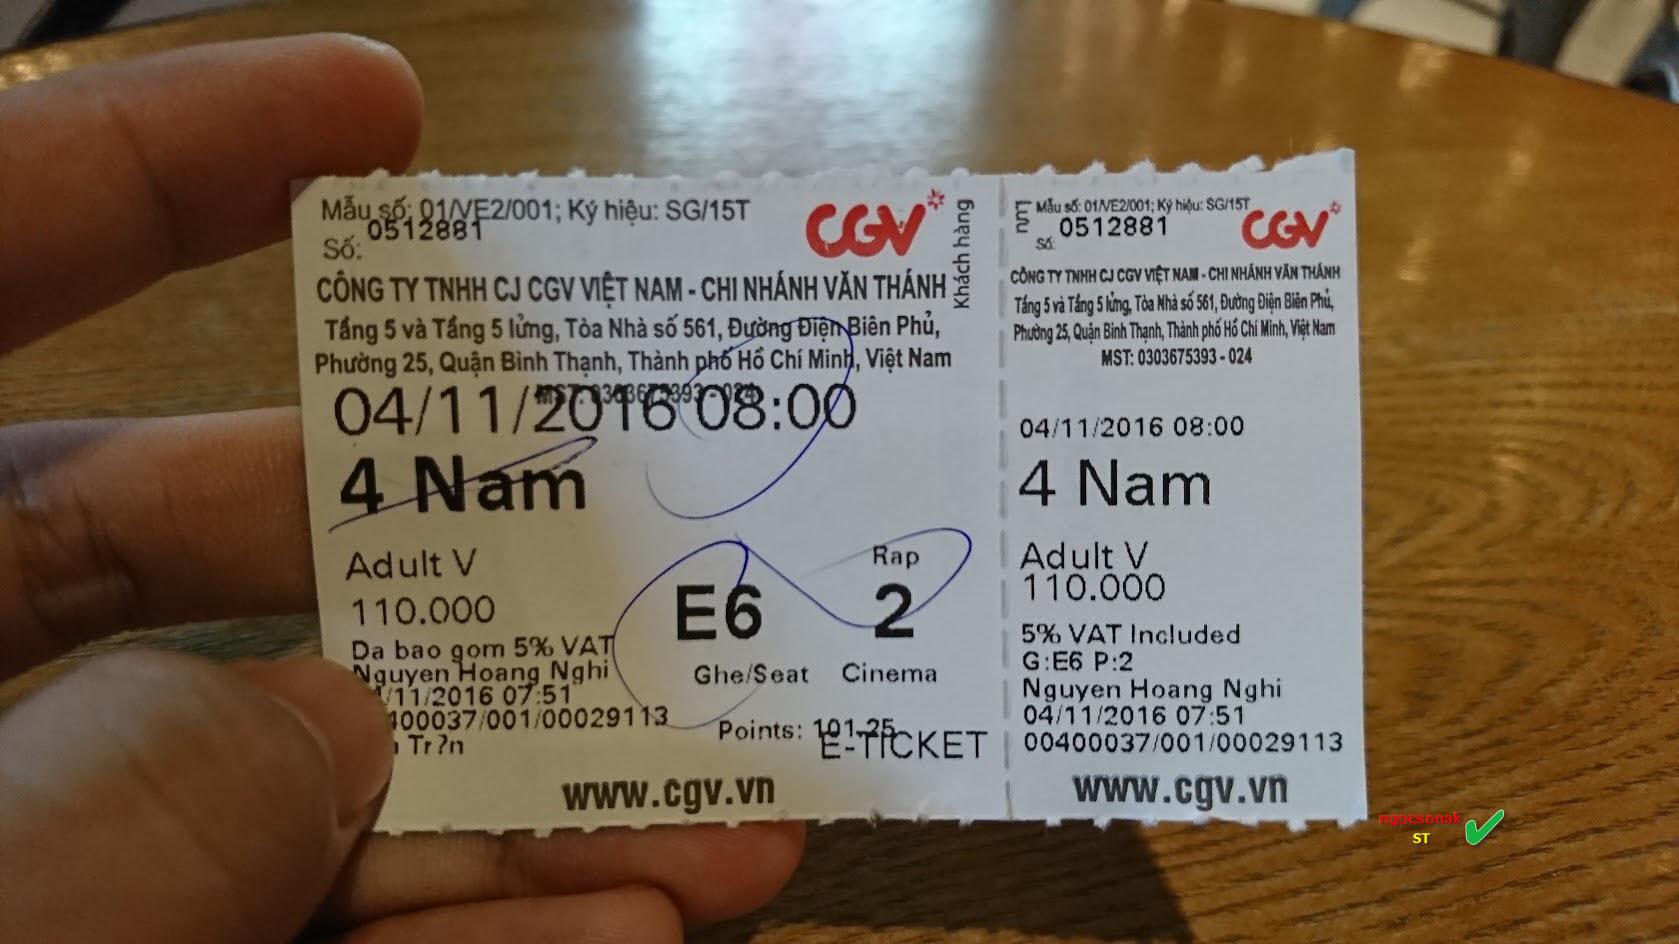 4nam2chang1tinhyeu-ticket-khenphim